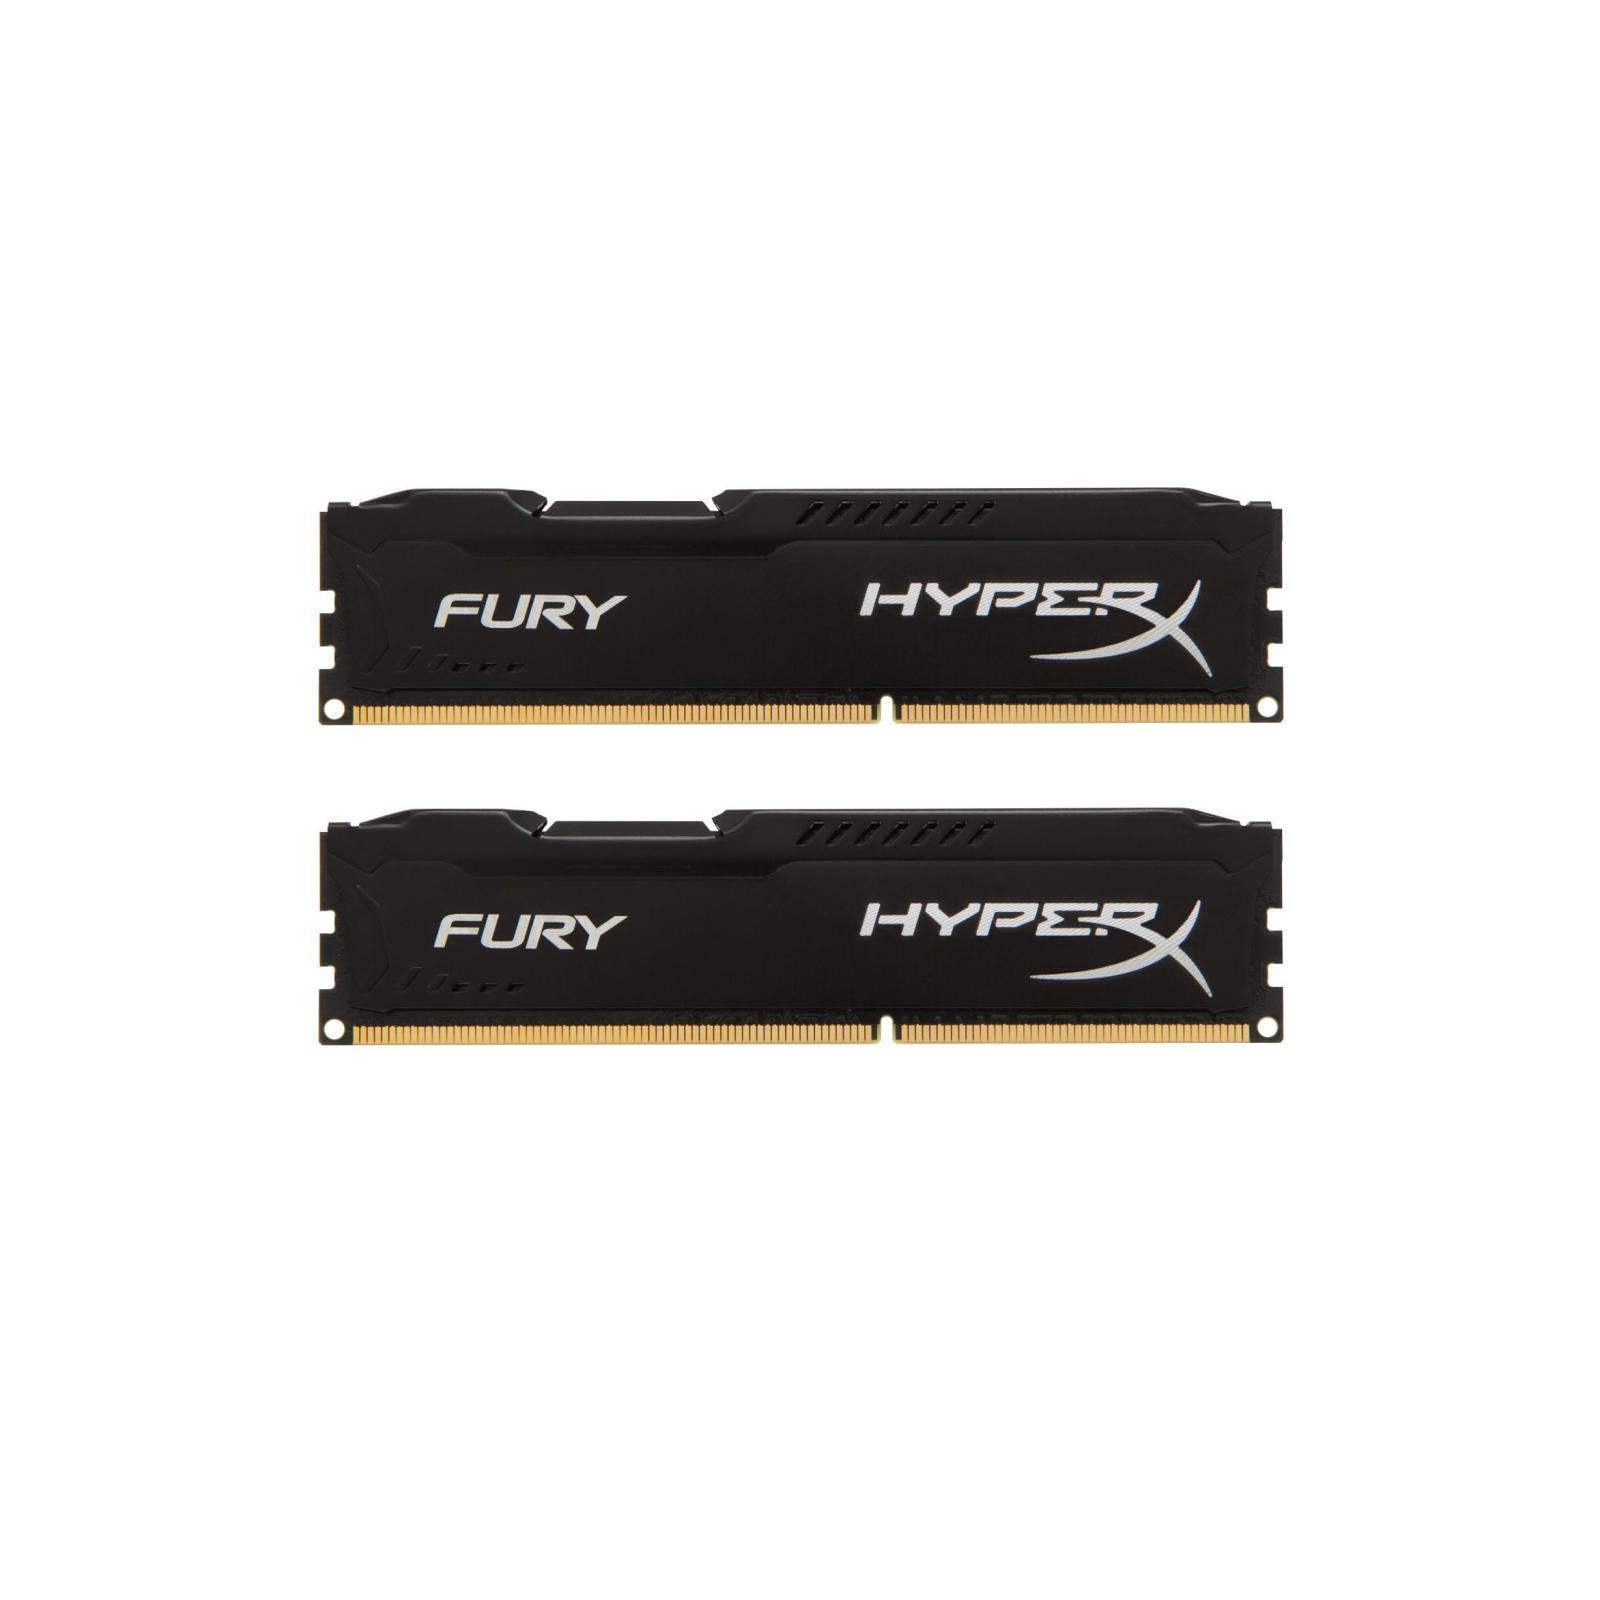 Модуль памяти для компьютера DDR4 32GB (2x16GB) 3200 MHz HyperX FURY Black HyperX (Kingston Fury) (HX432C18FBK2/32)